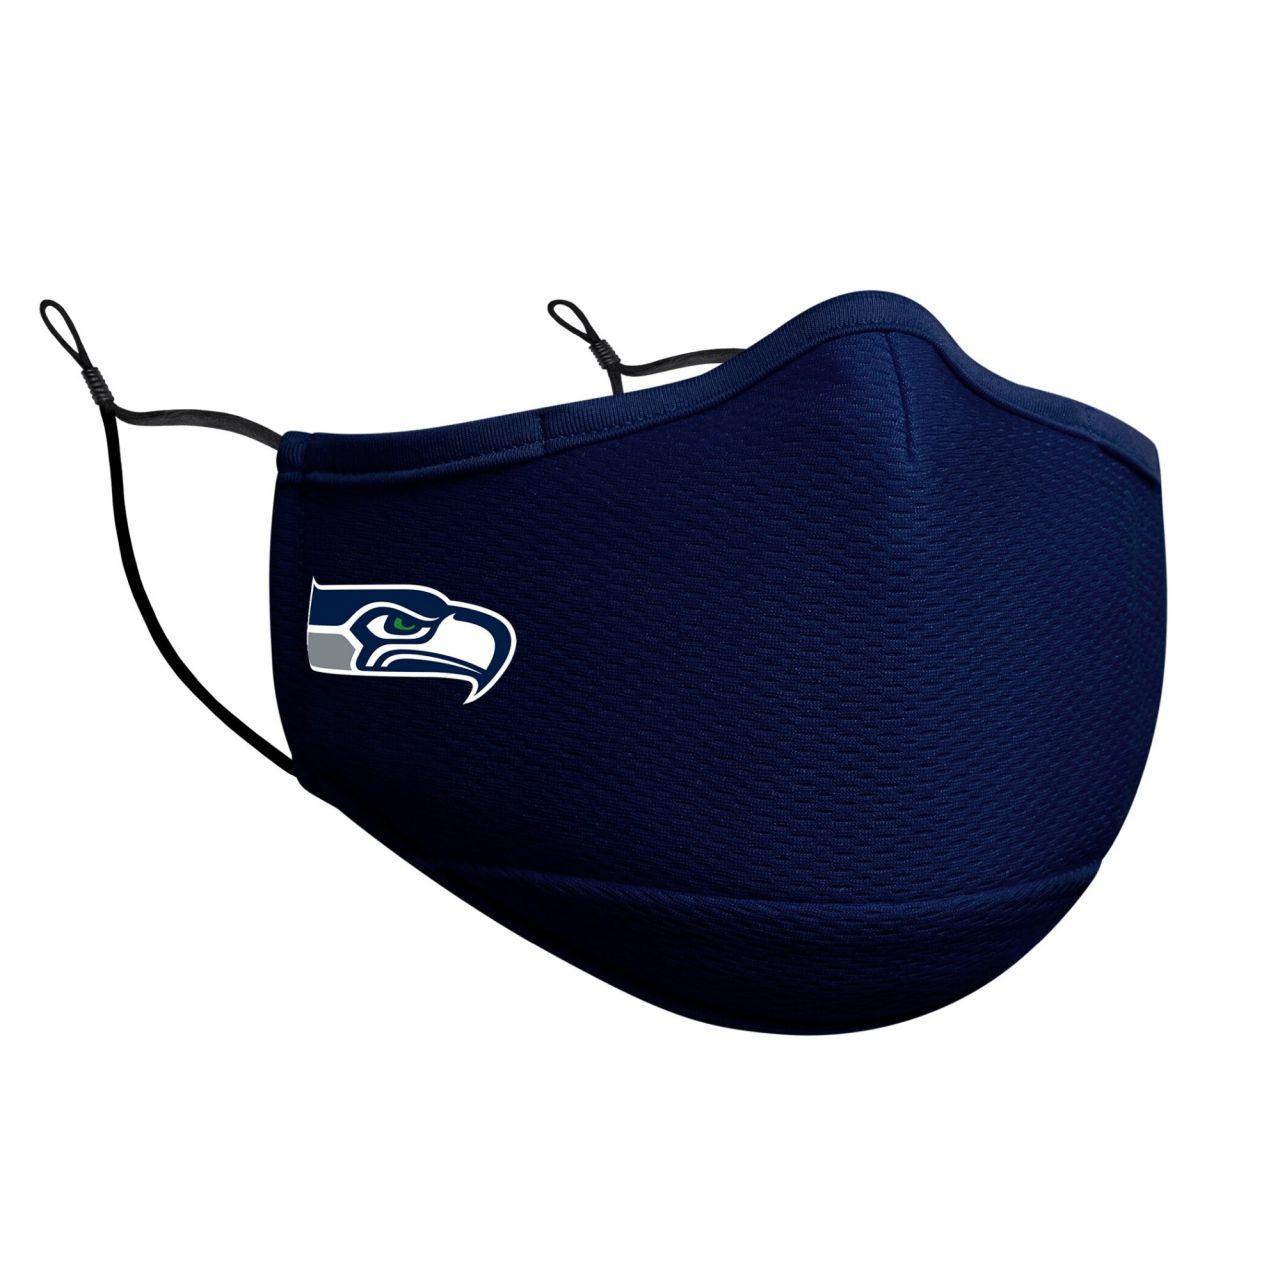 New Era NFL Face Mask Gesichtsmaske - Seattle Seahawks